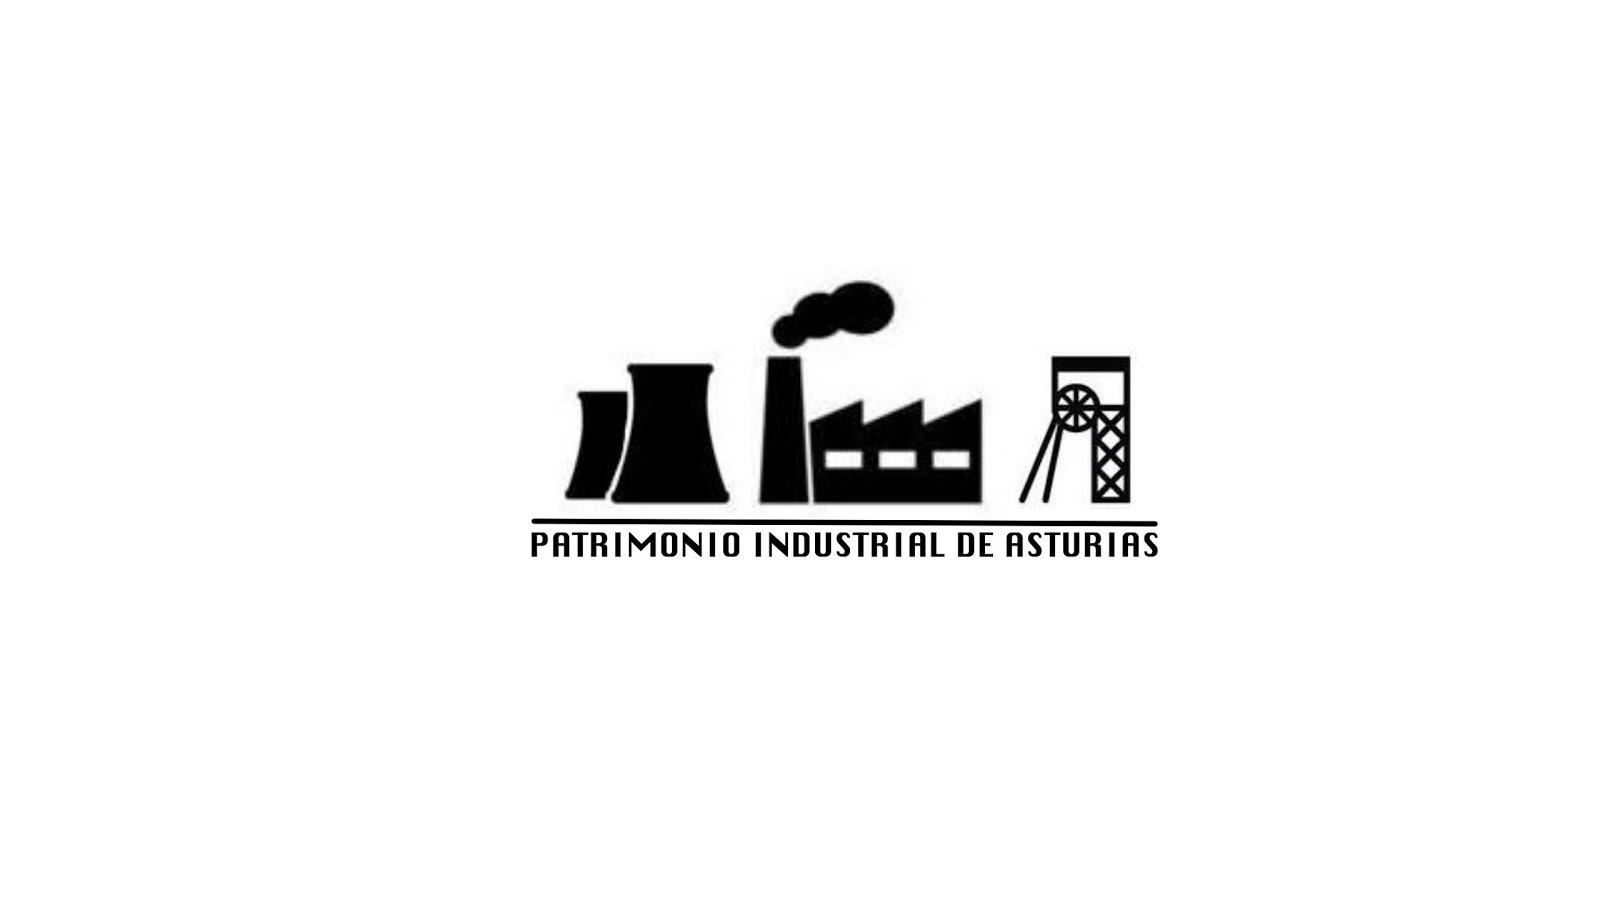 Patrimonio Industrial de Asturias